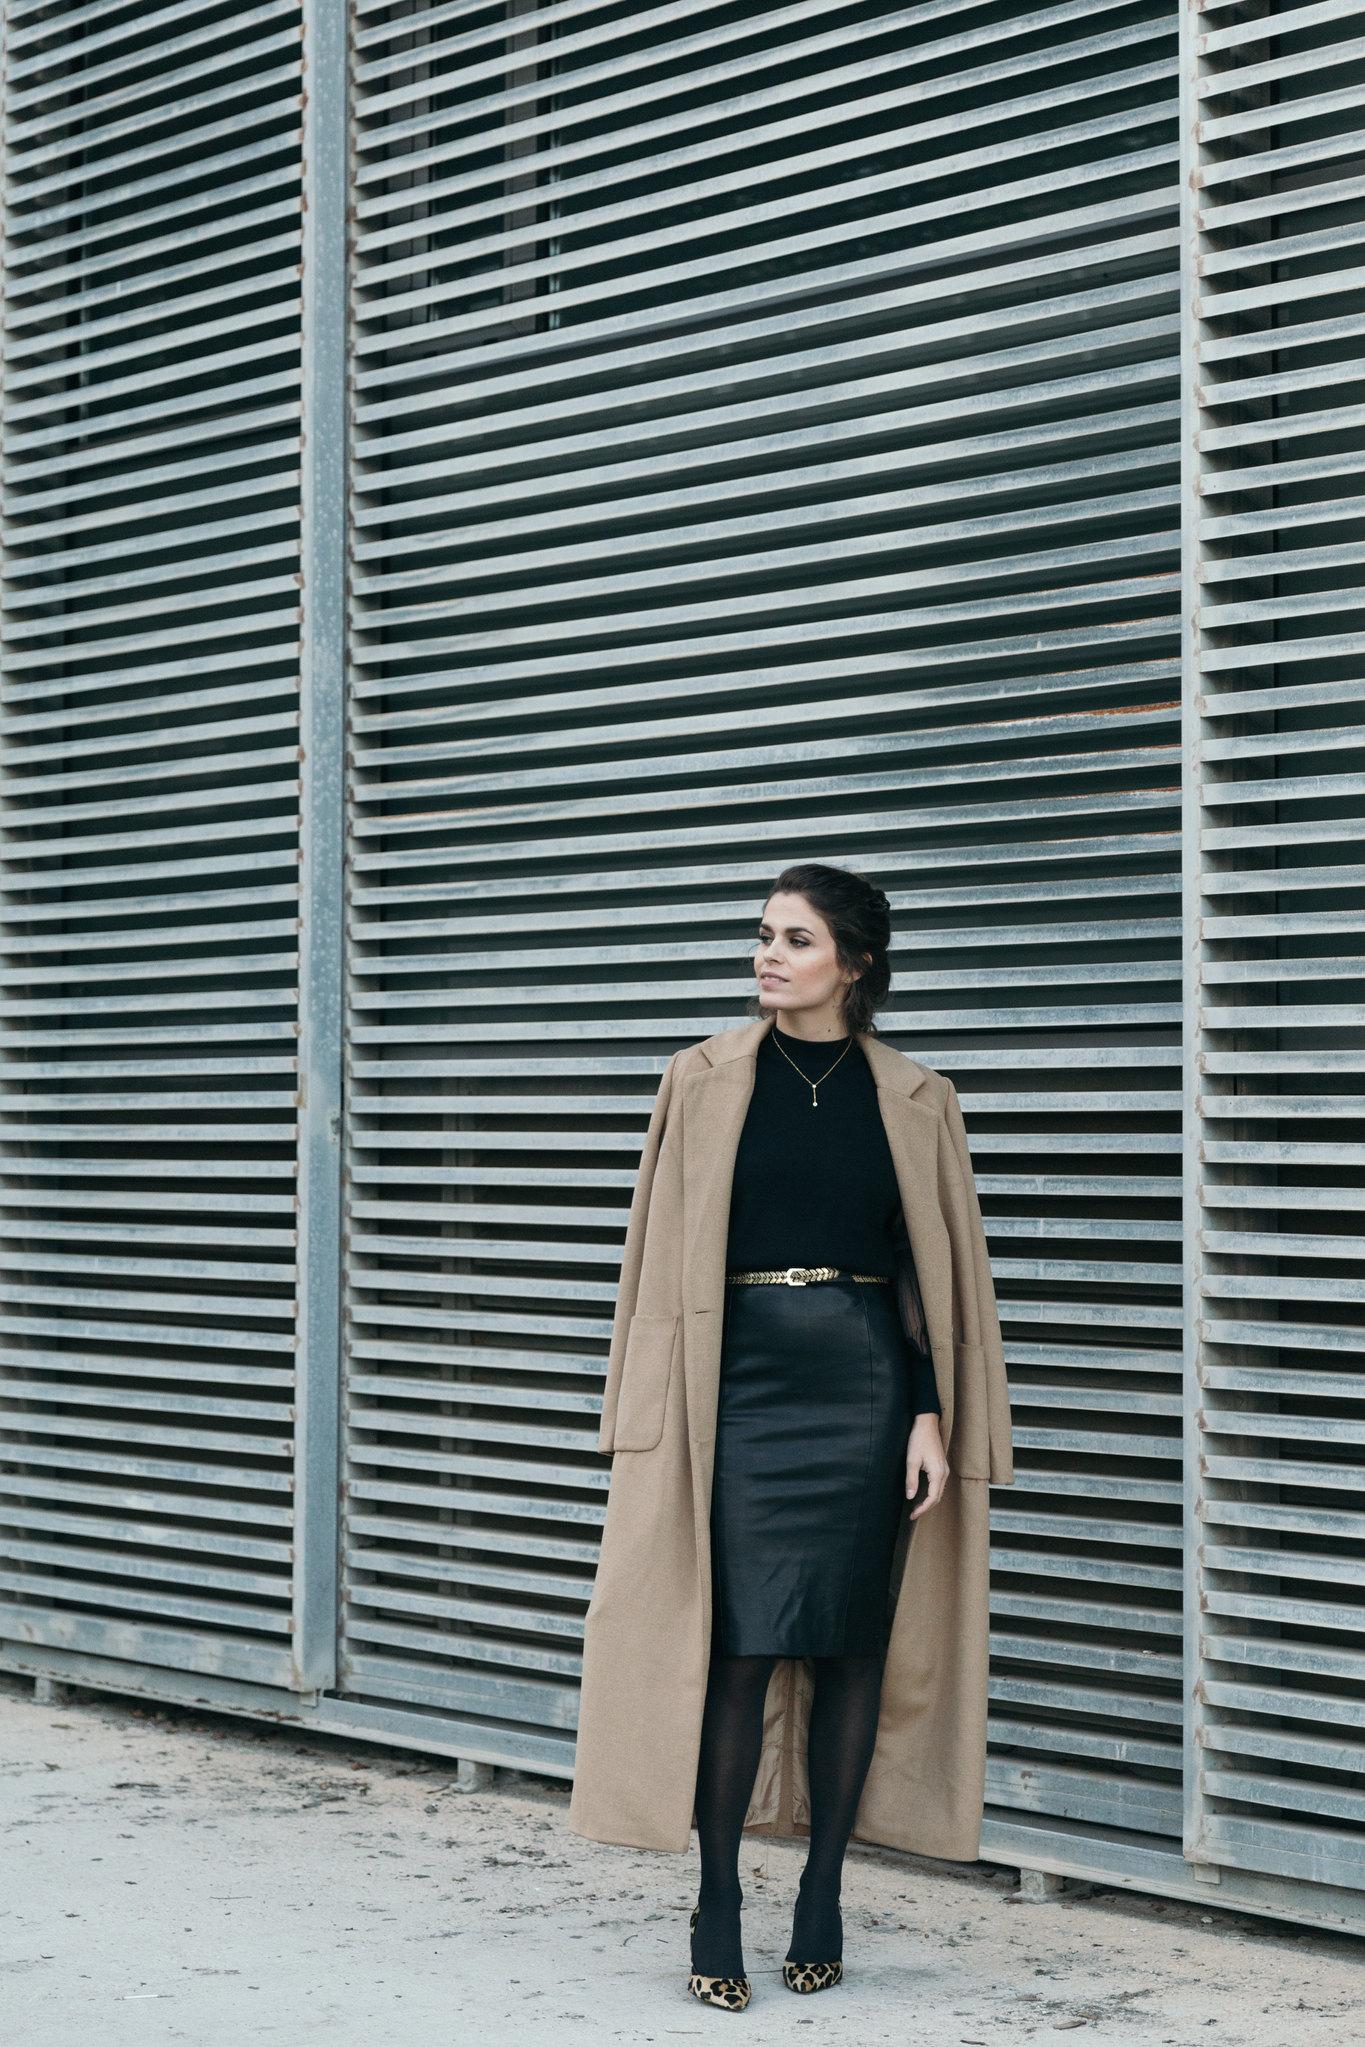 Jessie Chanes - Seams for a desire -1